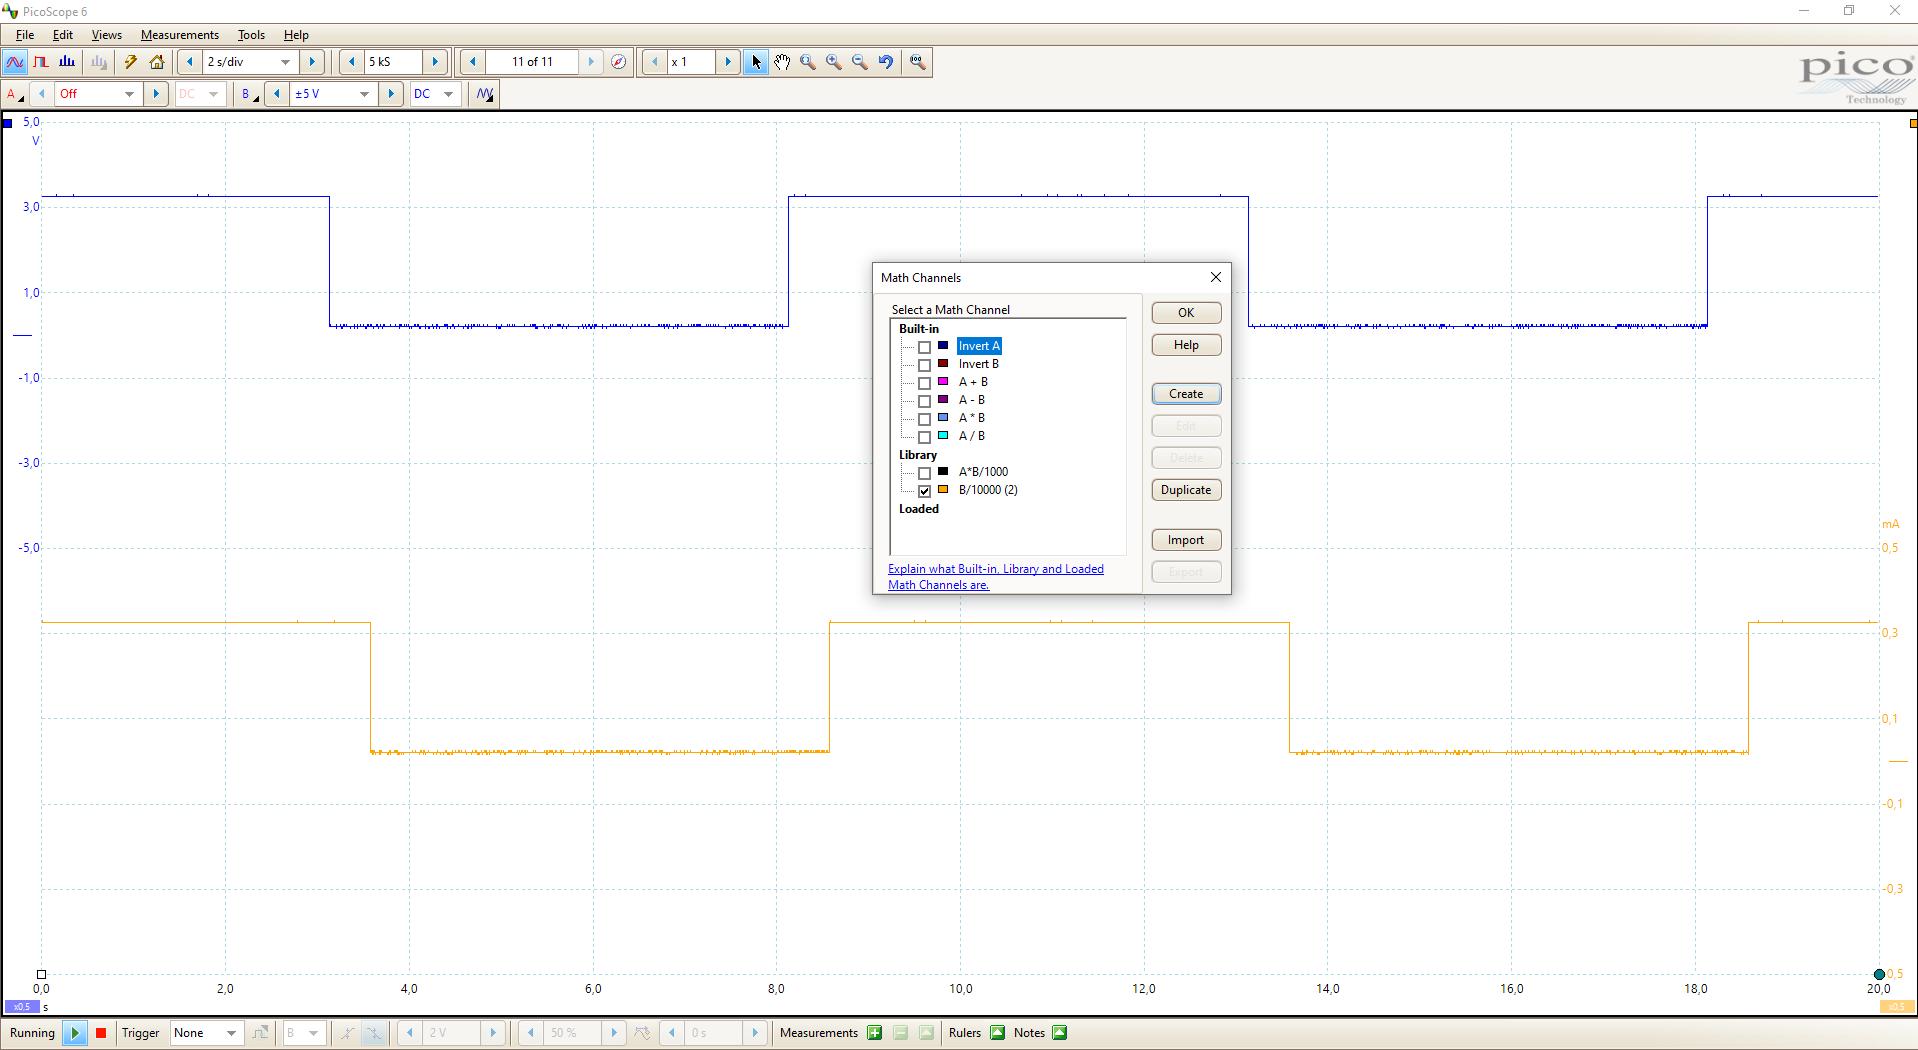 Oscilloscope Current Measurement